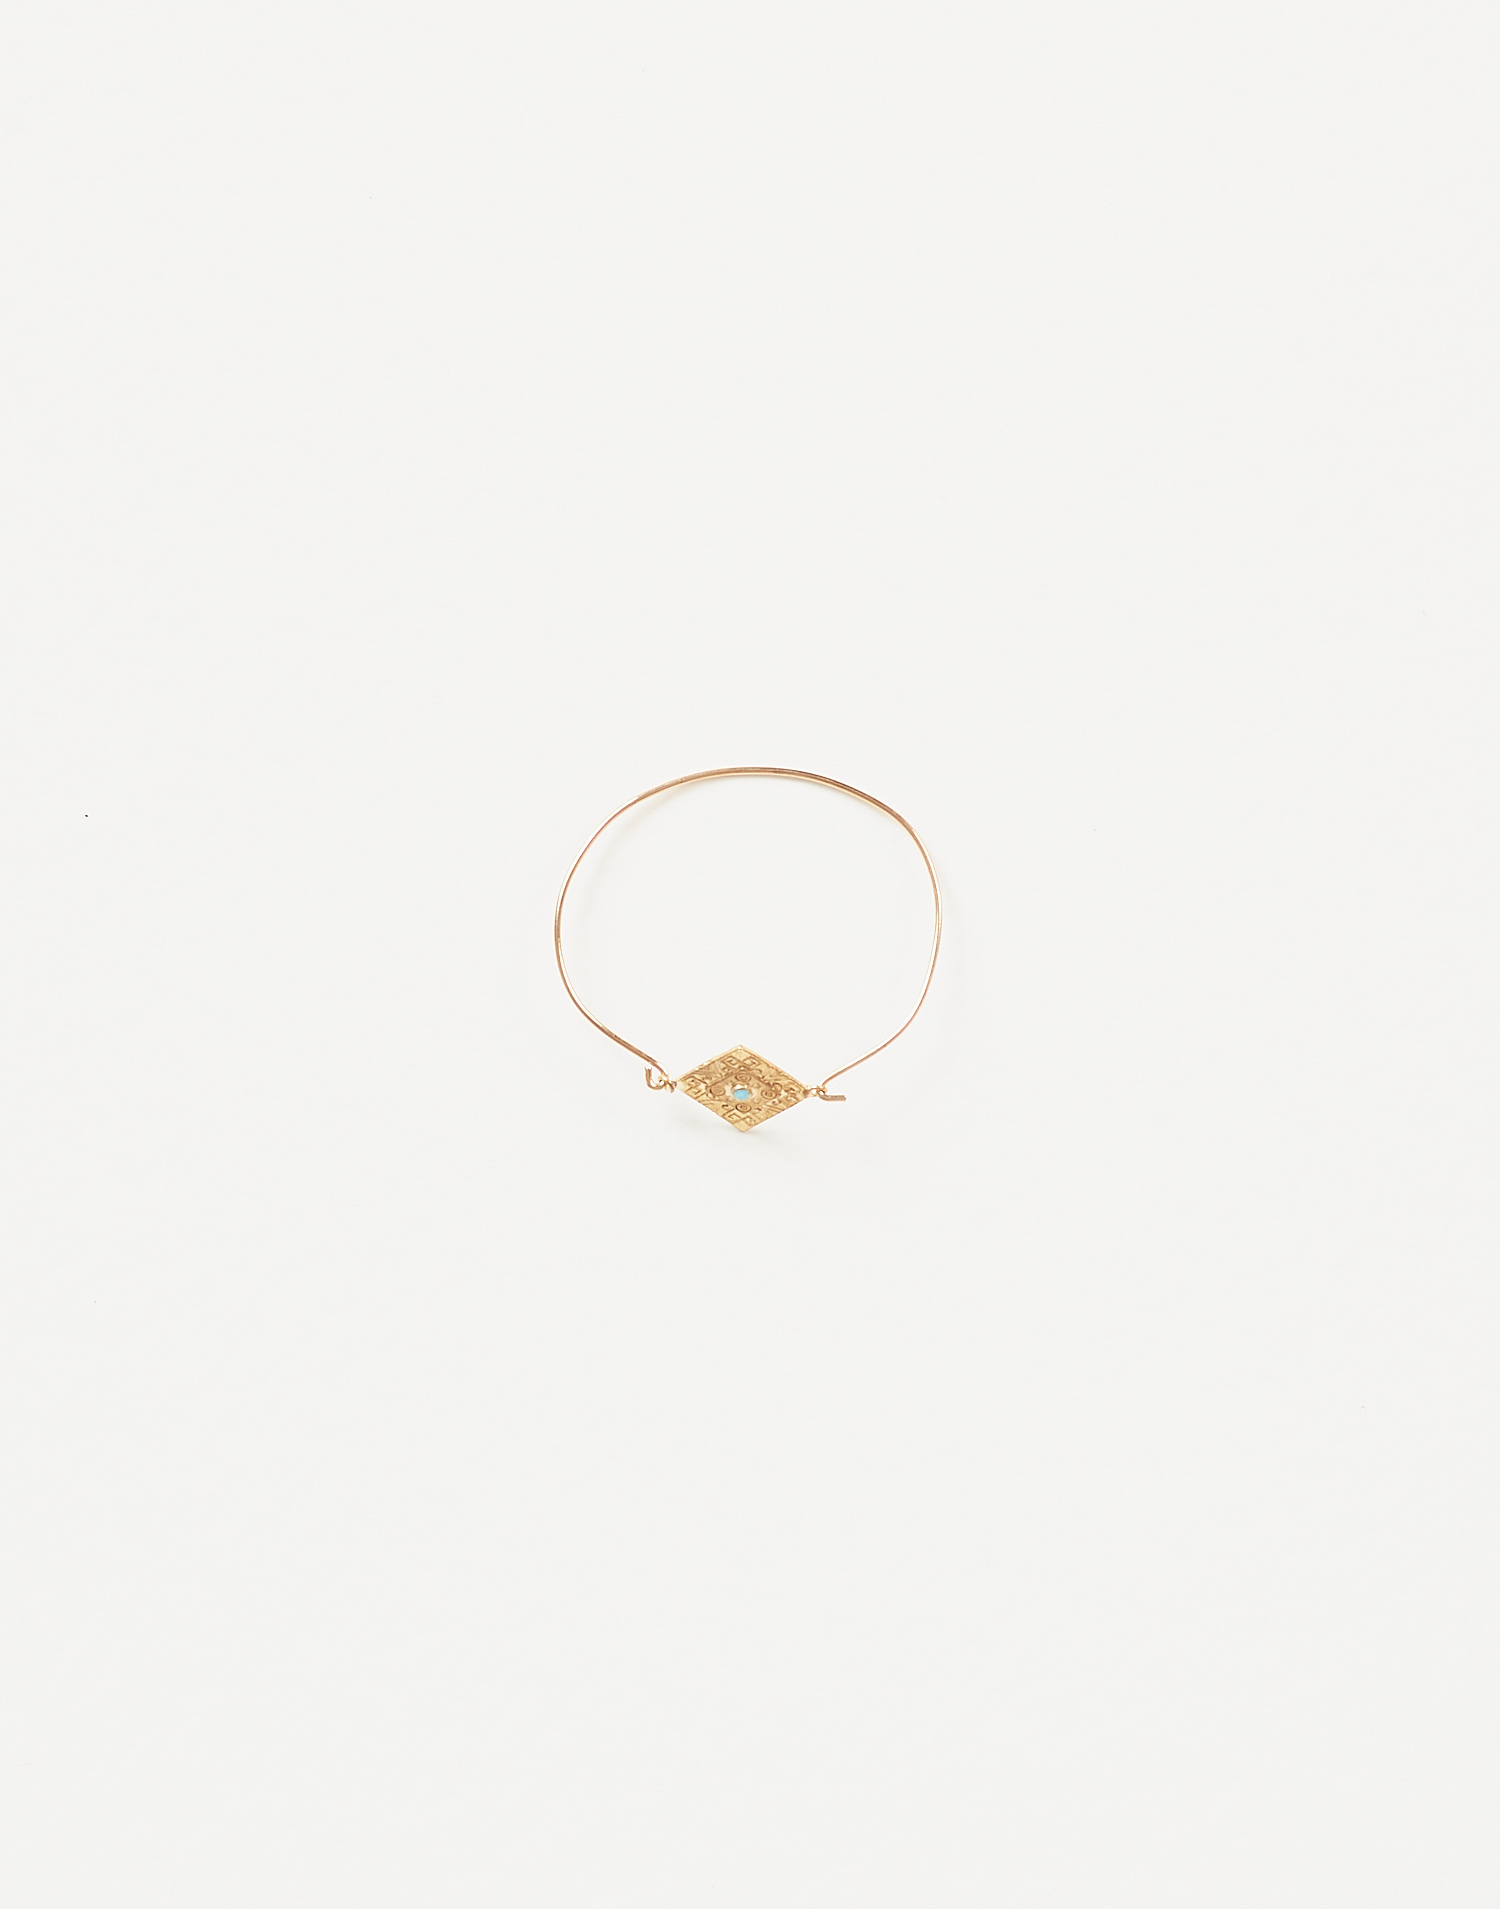 Triangular ethnic bracelet